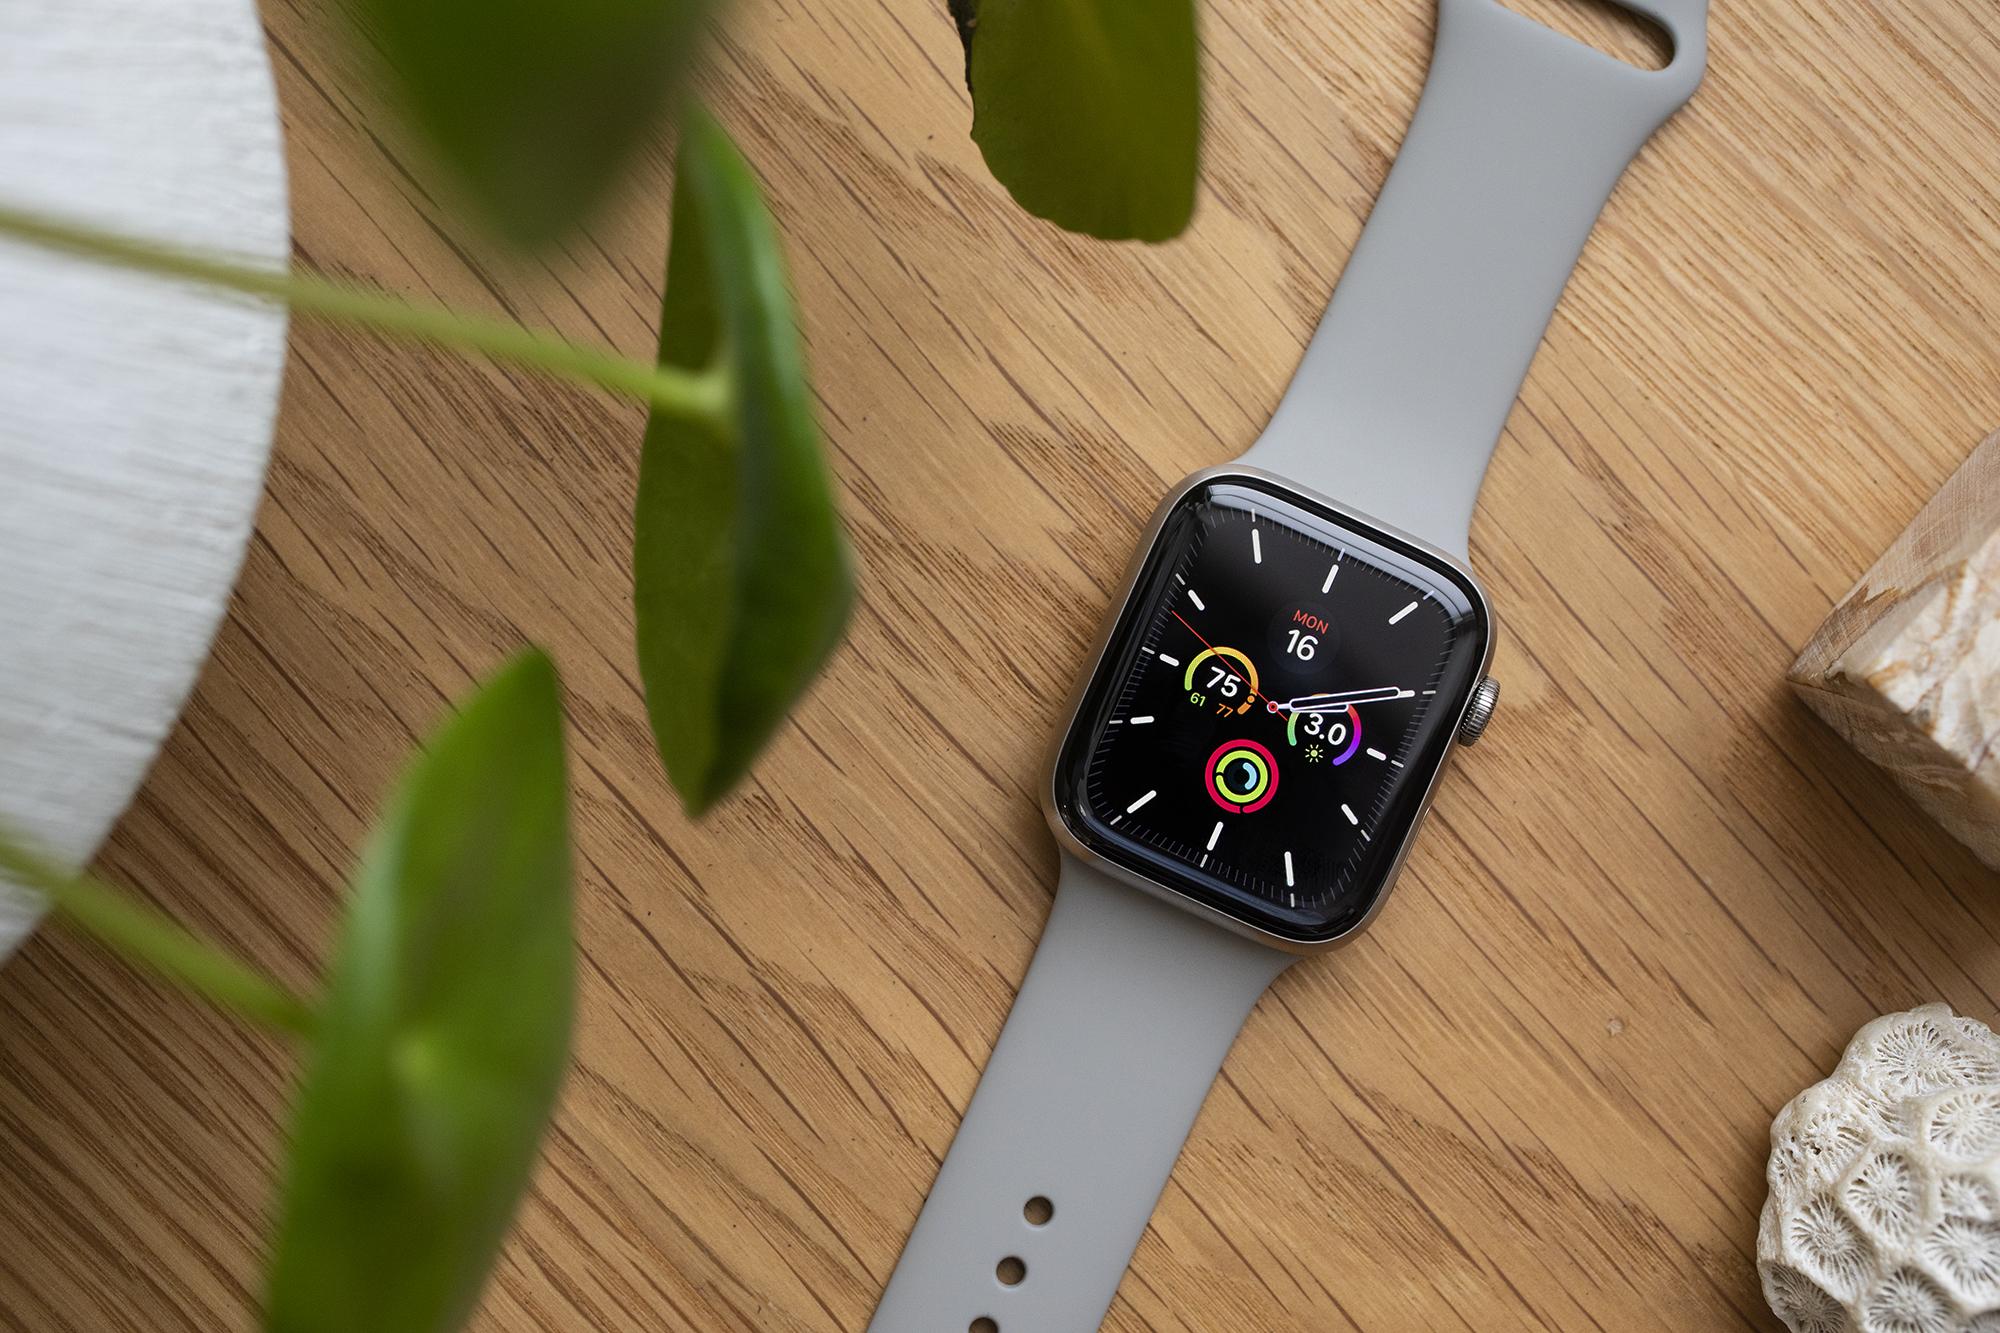 Apple Watch Series 5 lifestyle shot